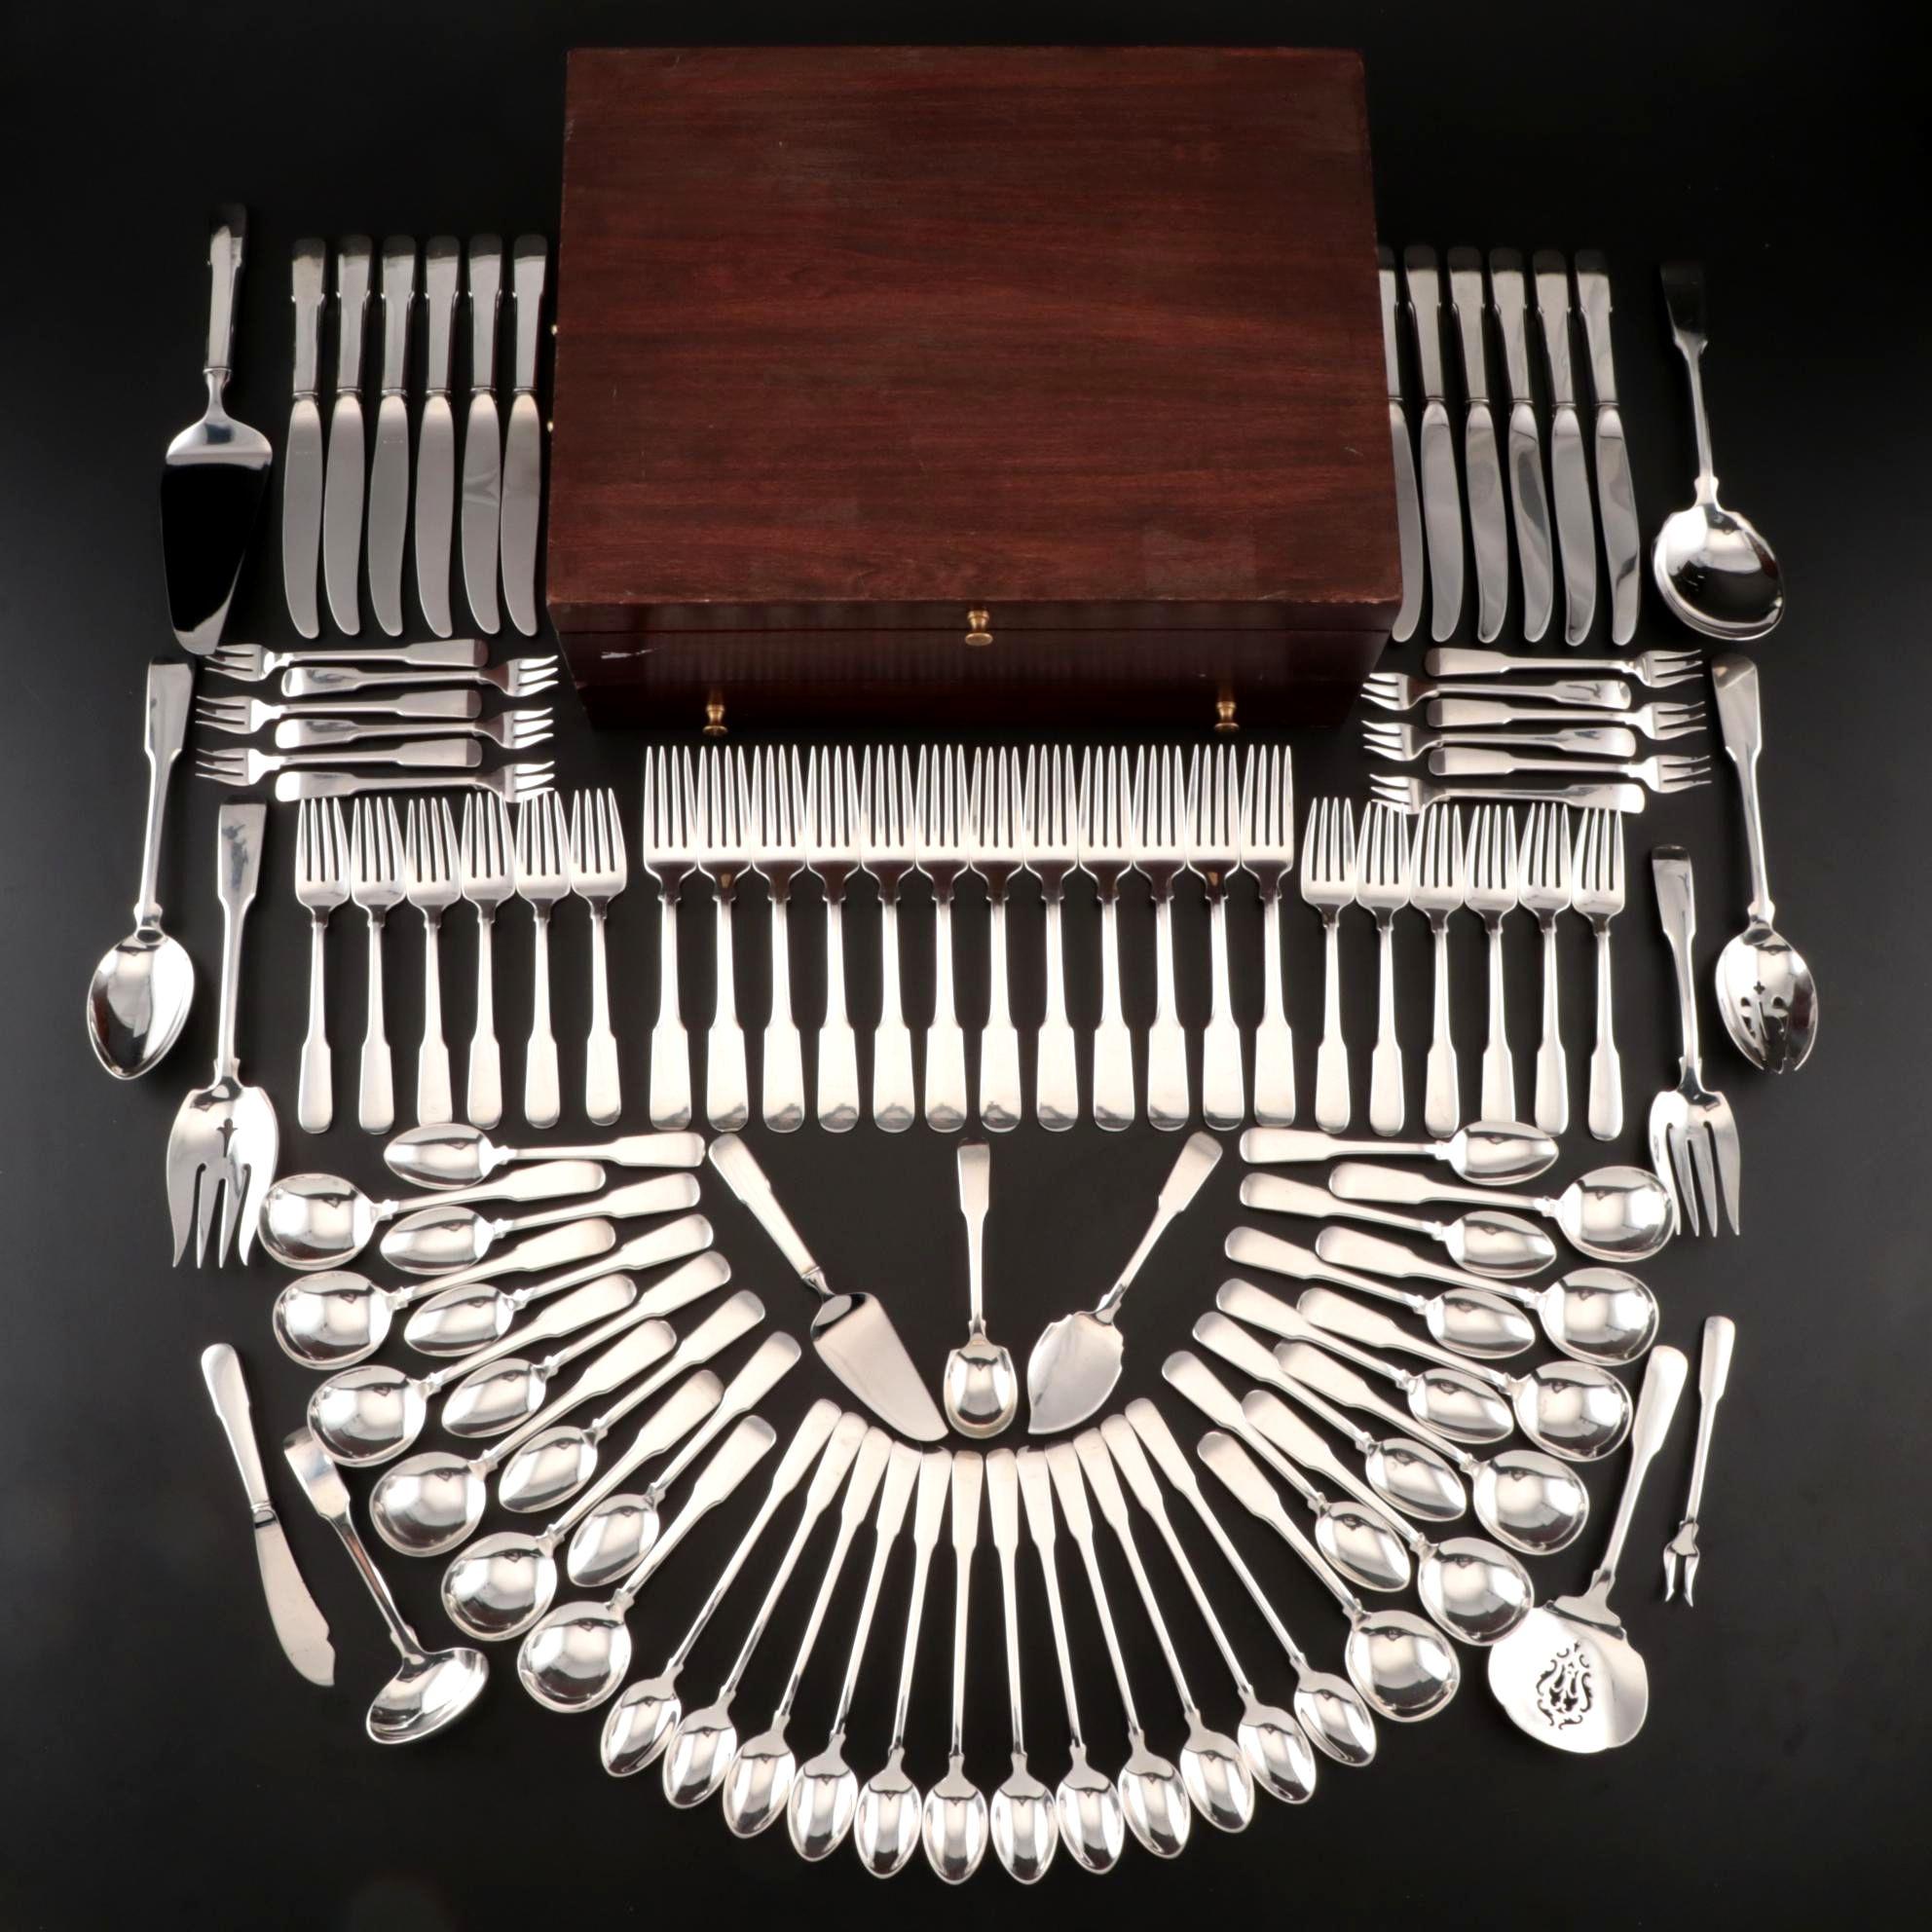 Colonial Fiddle by Tuttle Sterling Silver Serving Spoon Pierced Original 9